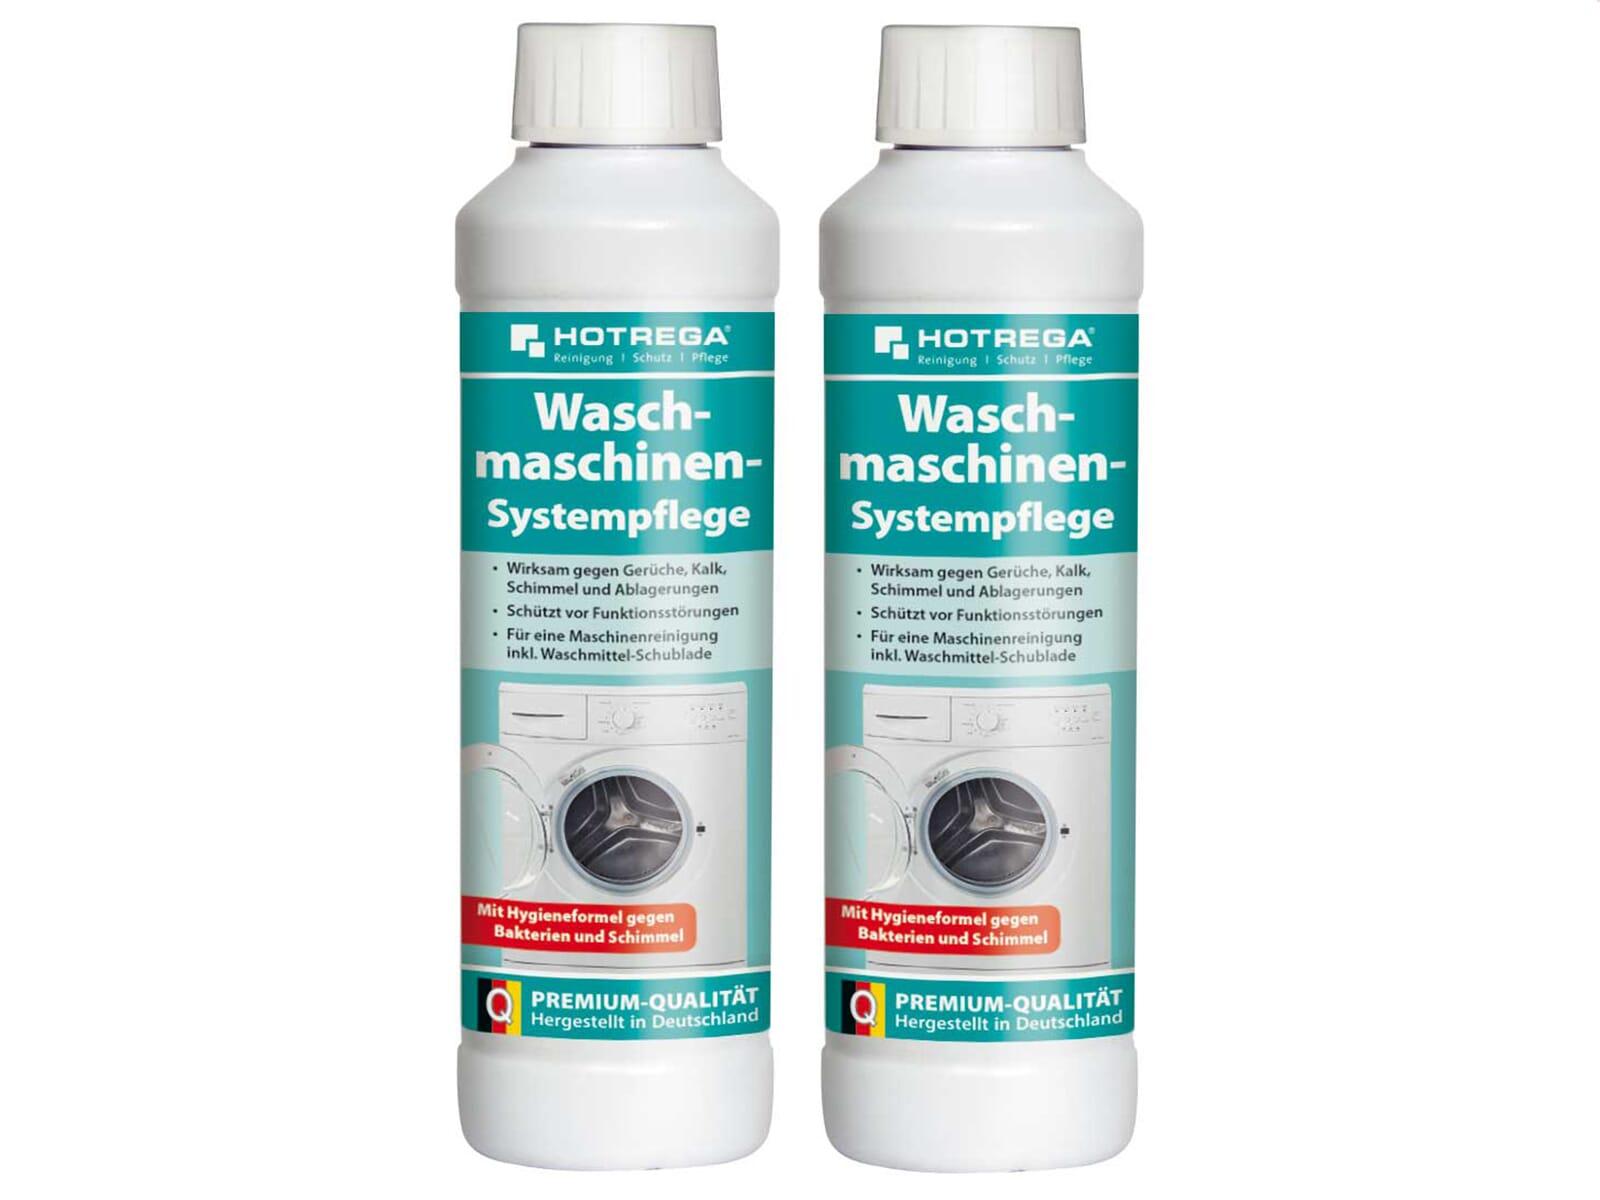 Hotrega H110290 Waschmaschinen-Systempflege - 2er Set